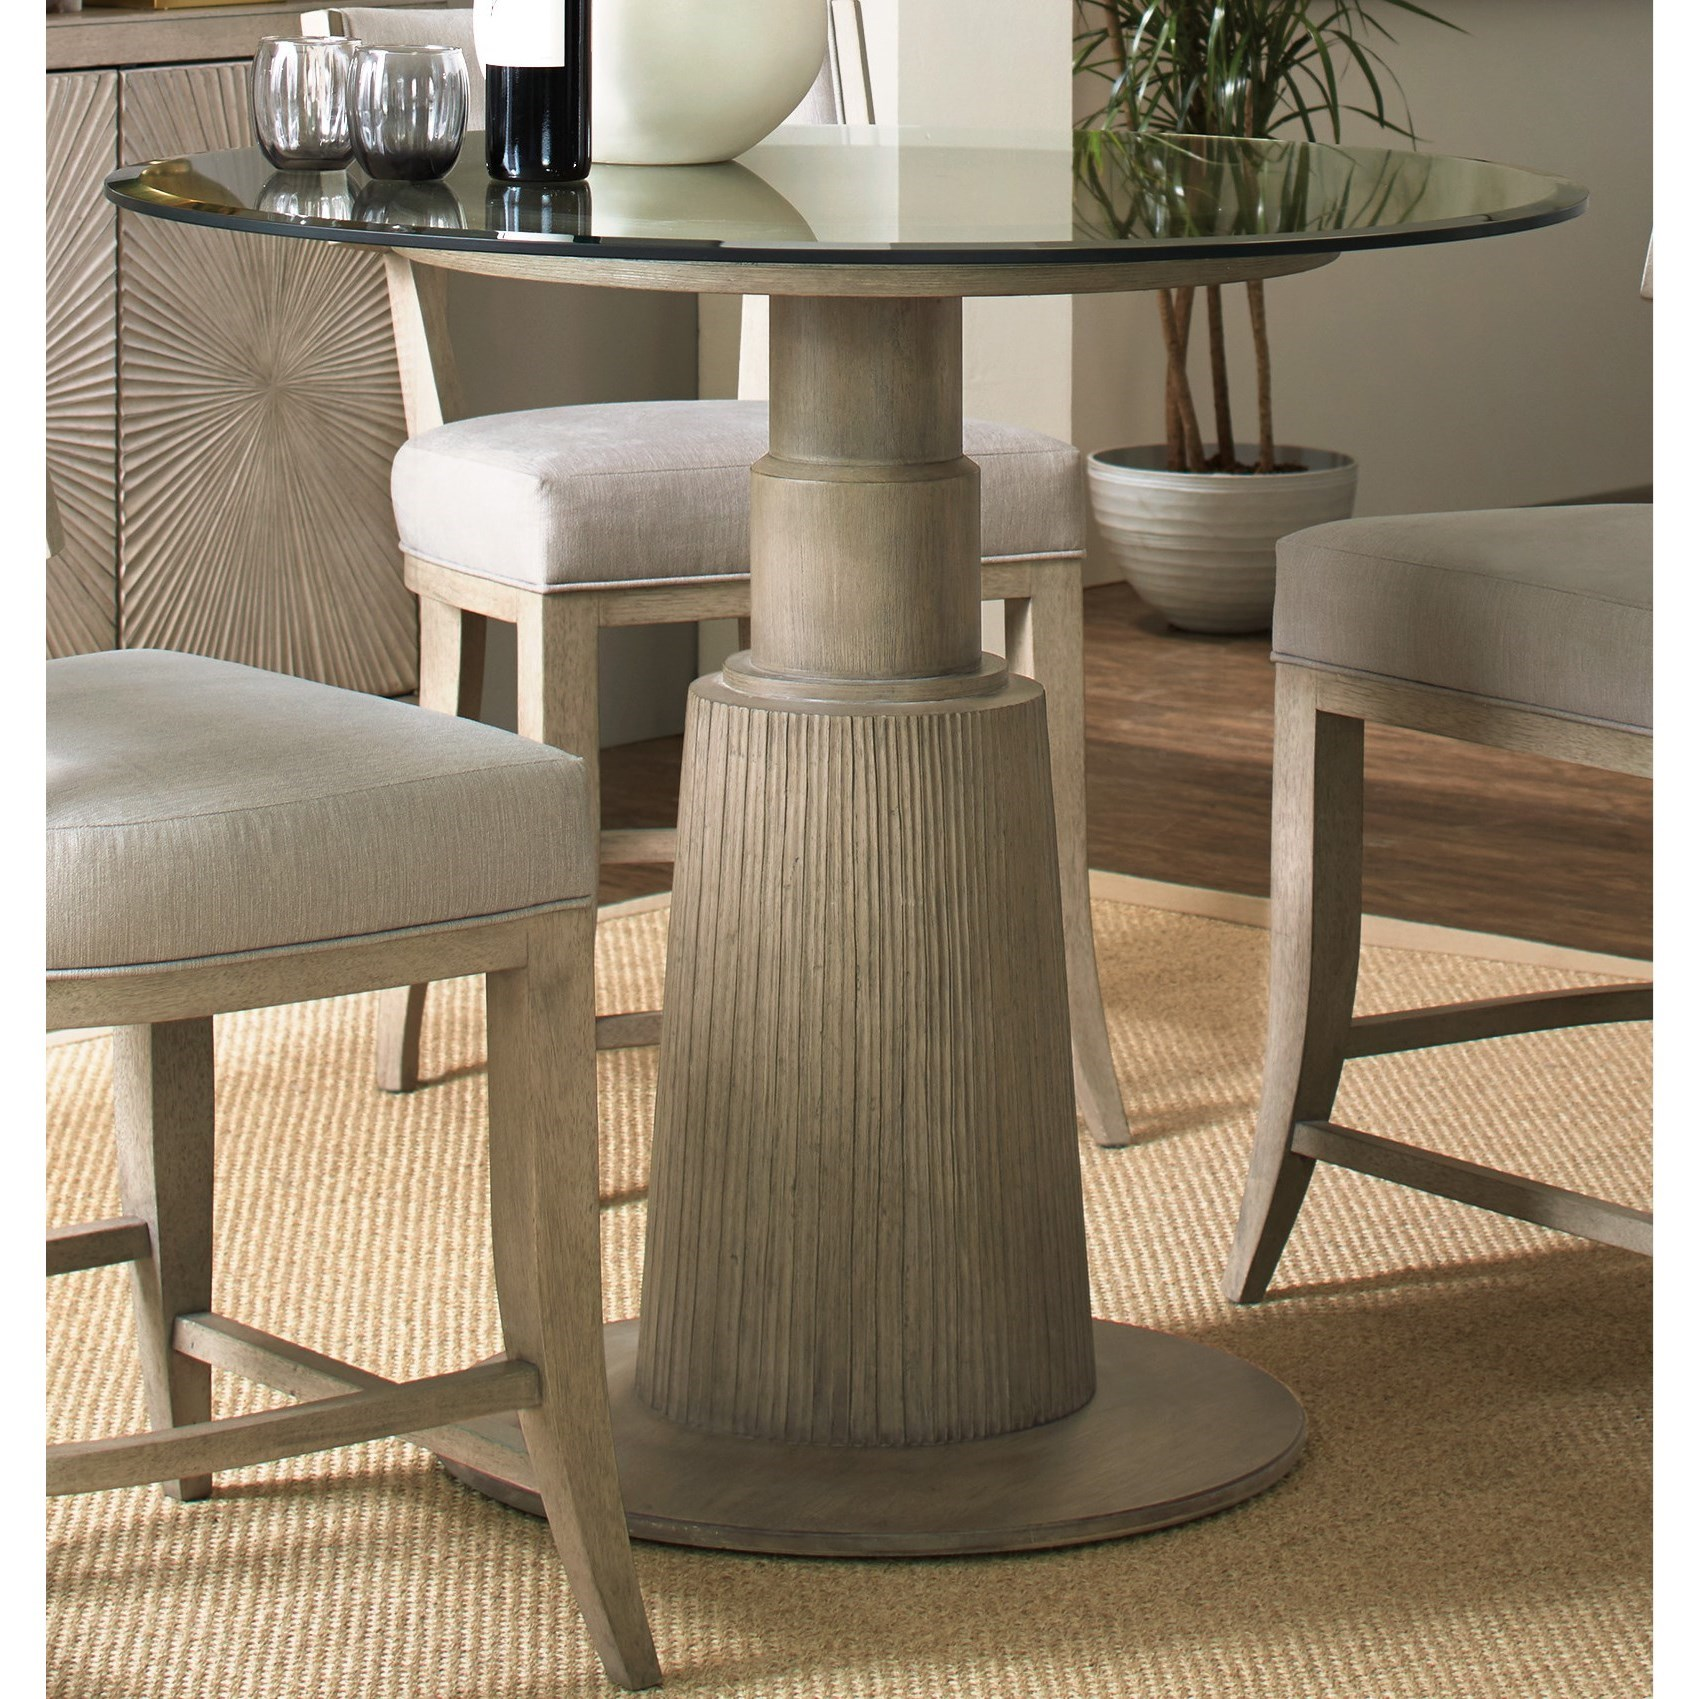 Hooker Furniture Elixir Adjustable Height Round Dining Table - Item Number: 5990-75203-42